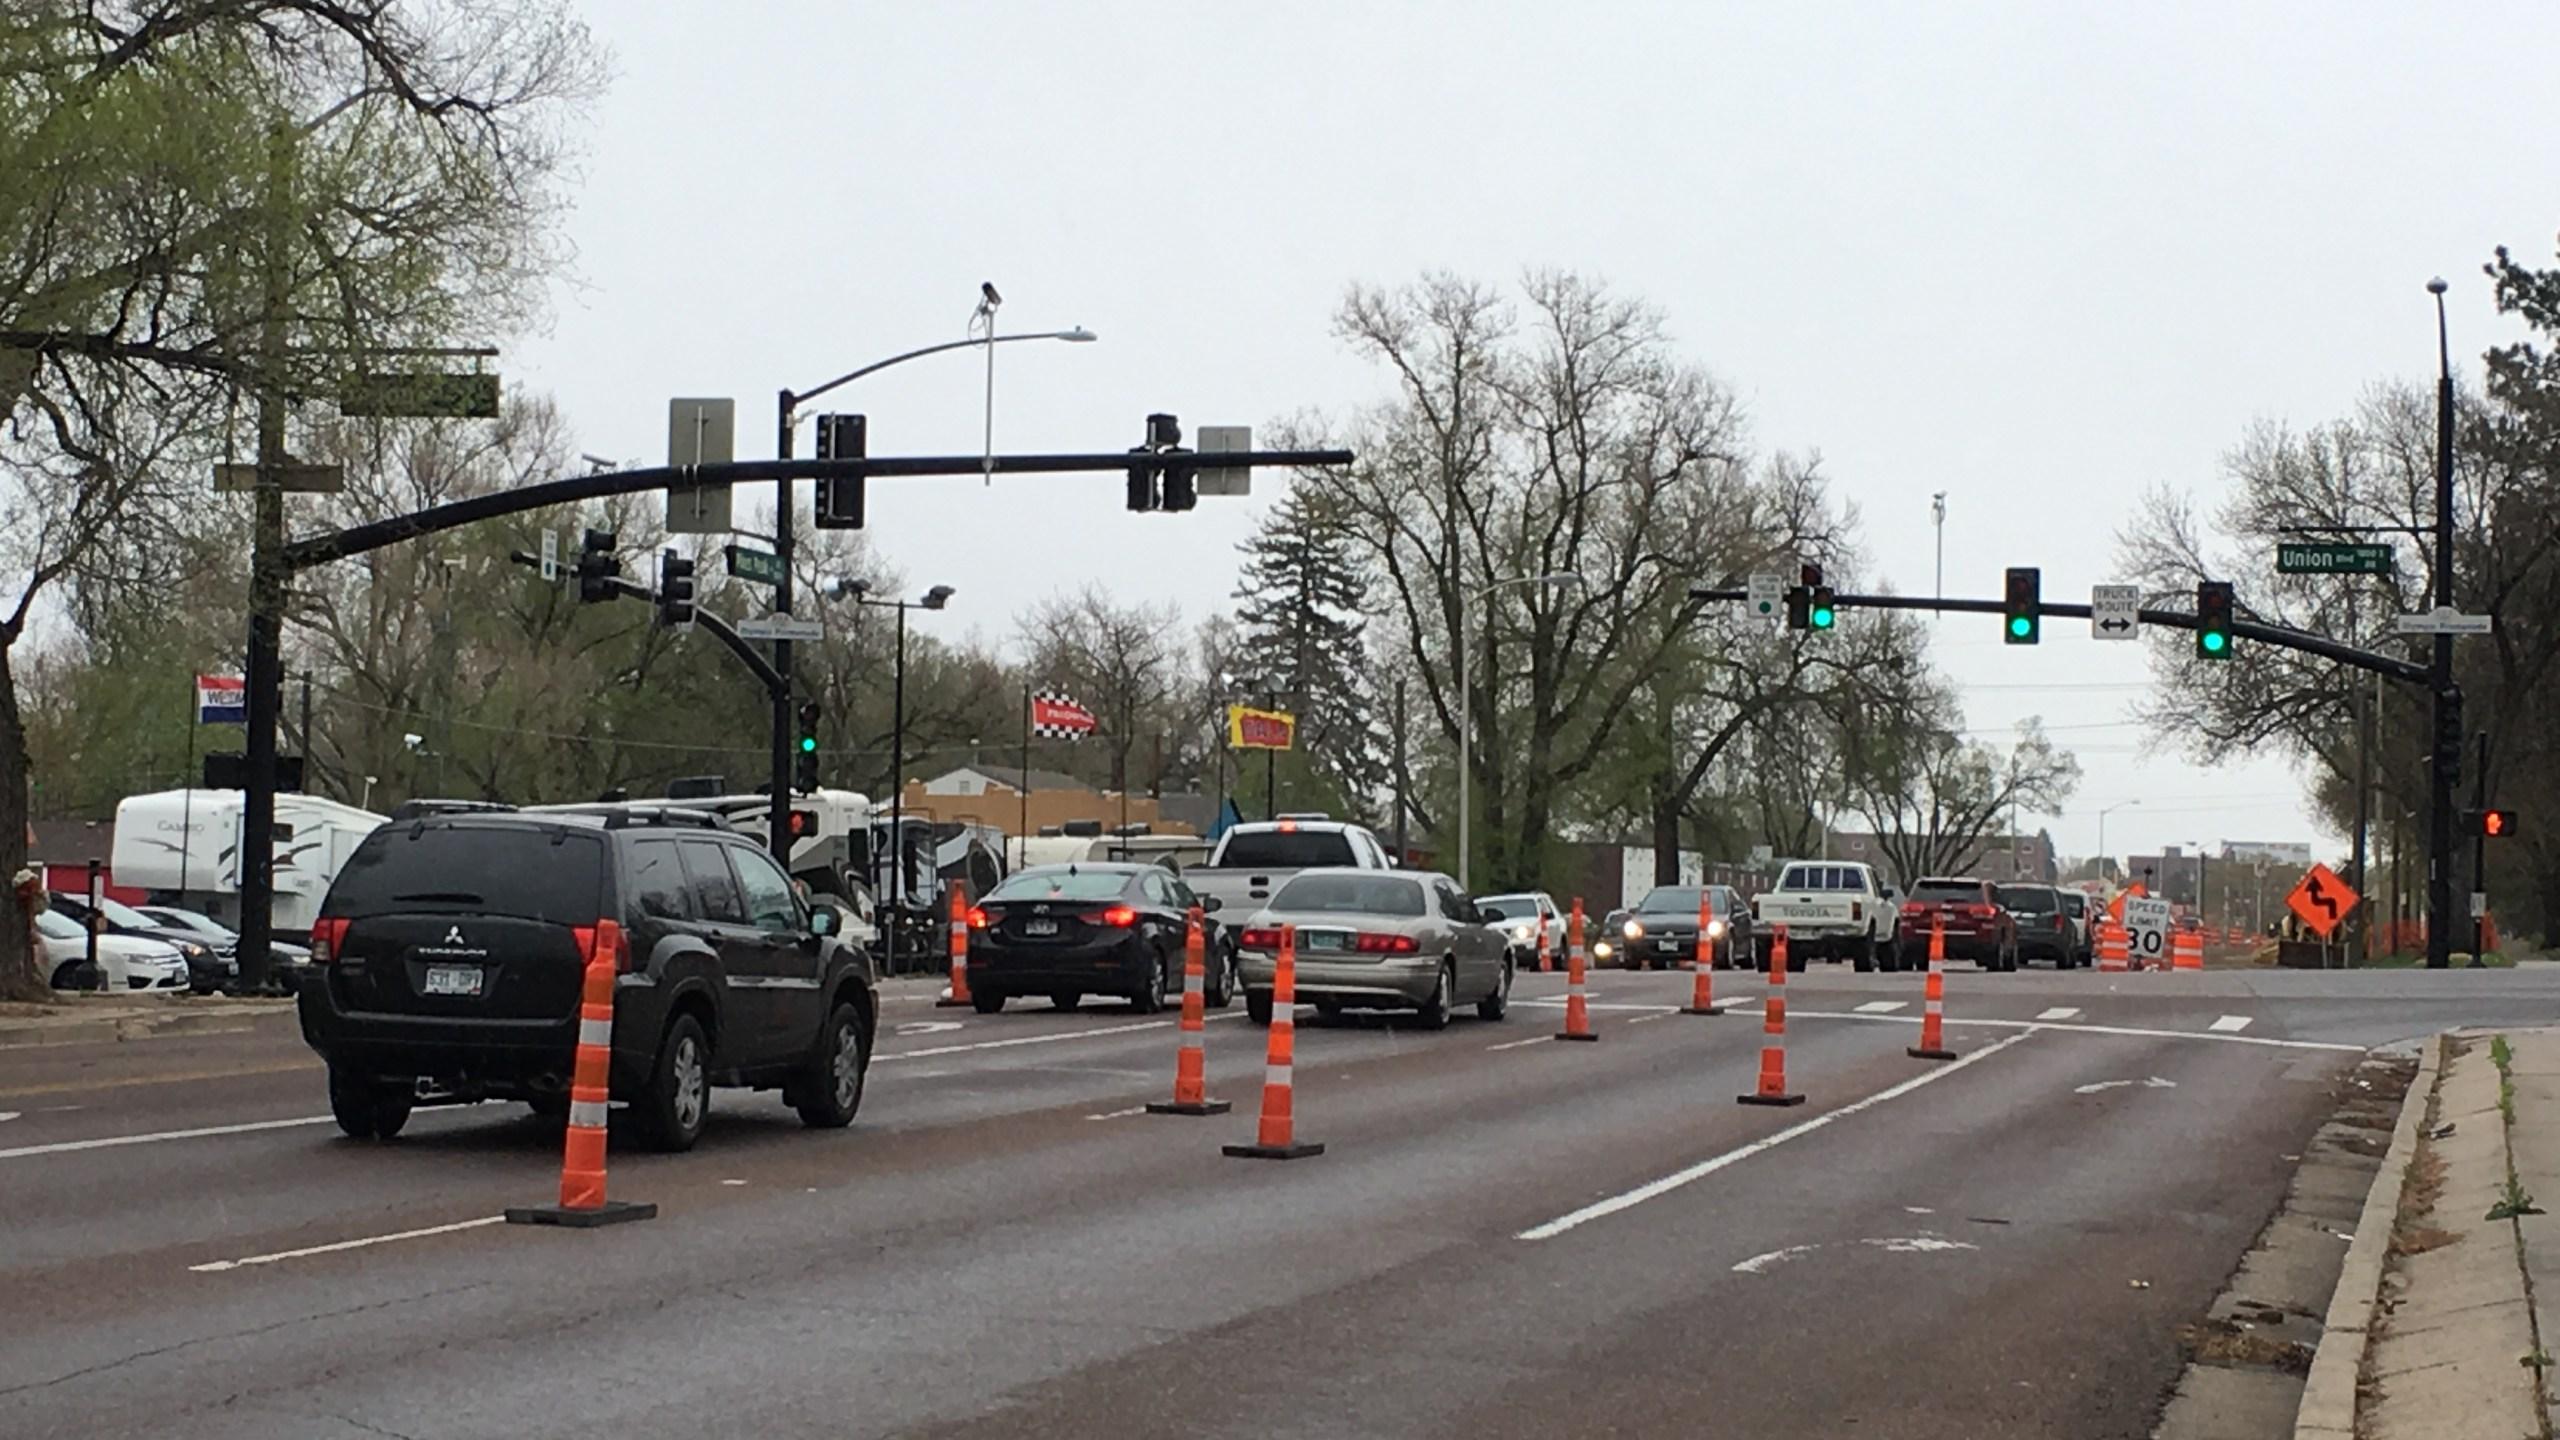 The intersection of Union Boulevard and Pikes Peak Avenue Thursday morning. Paula Buck - FOX21 News